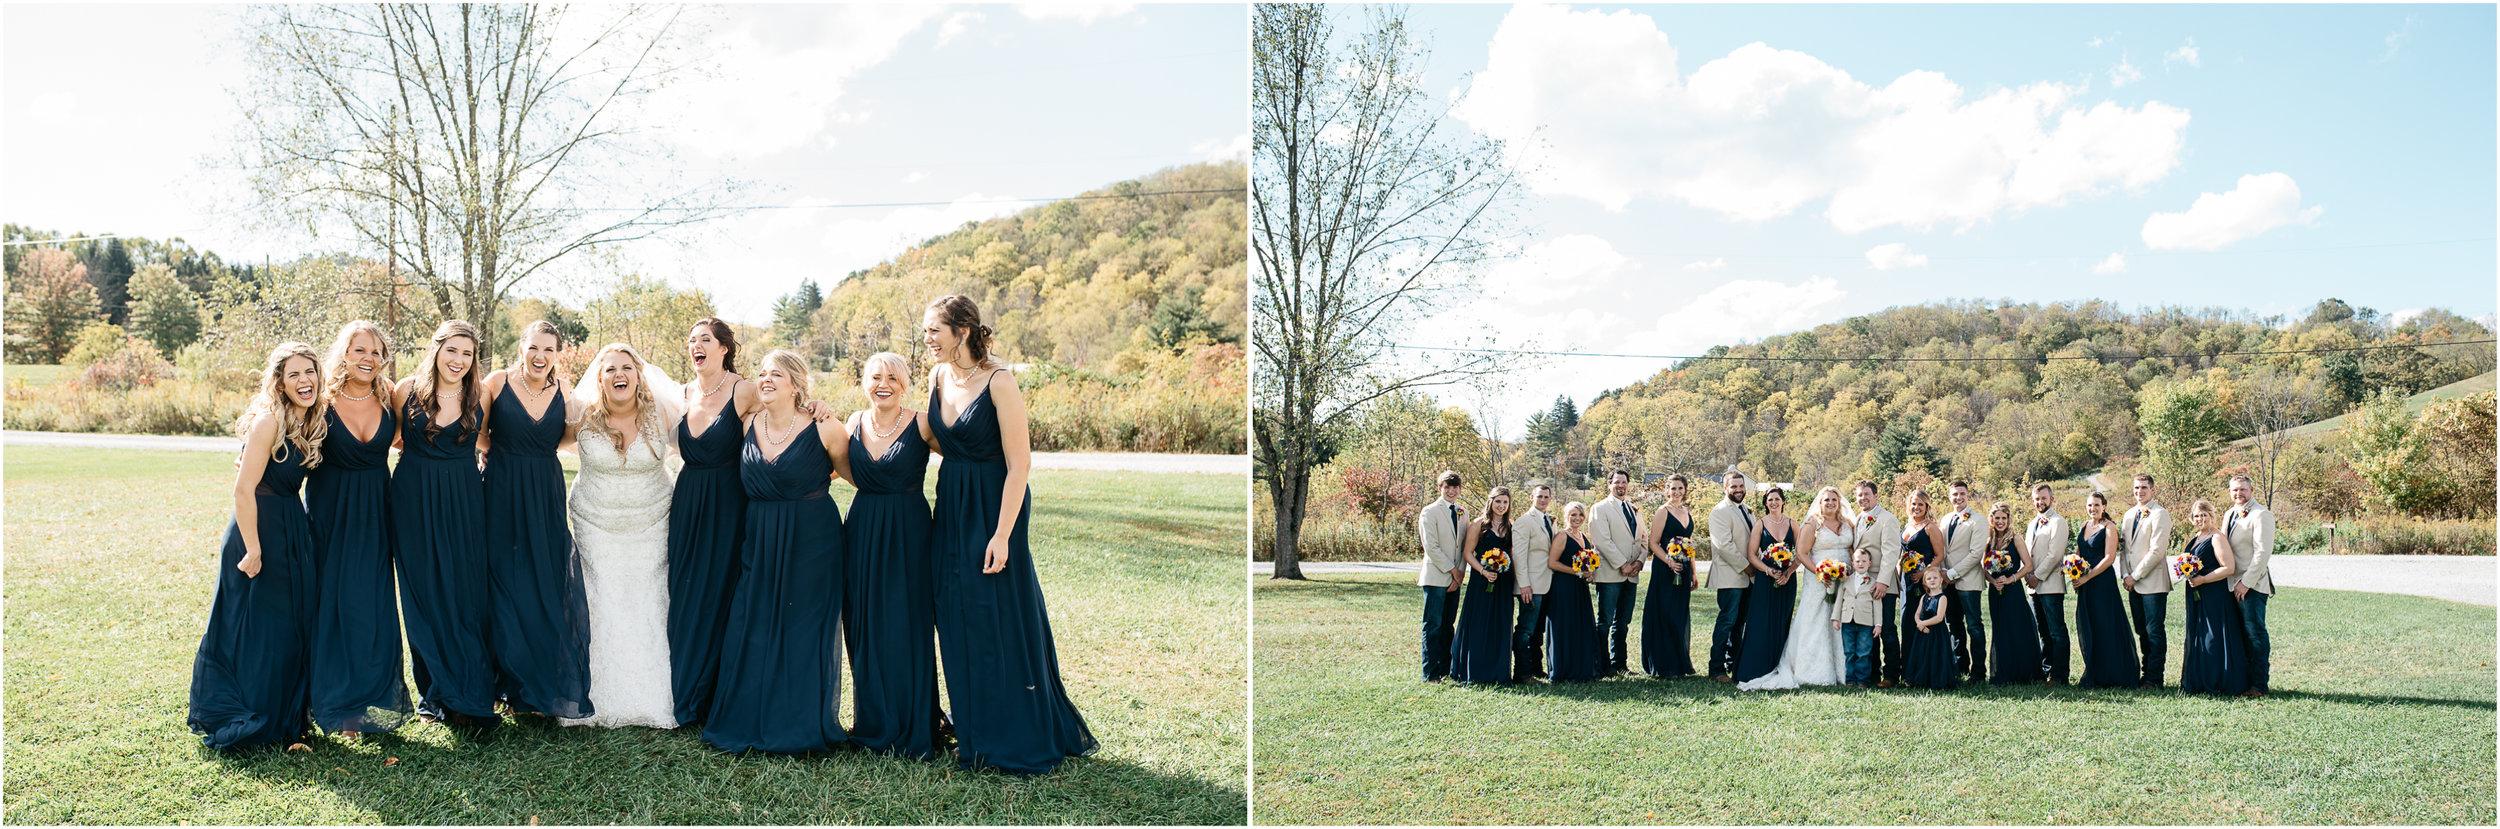 bridal party photos ligonier photography.jpg